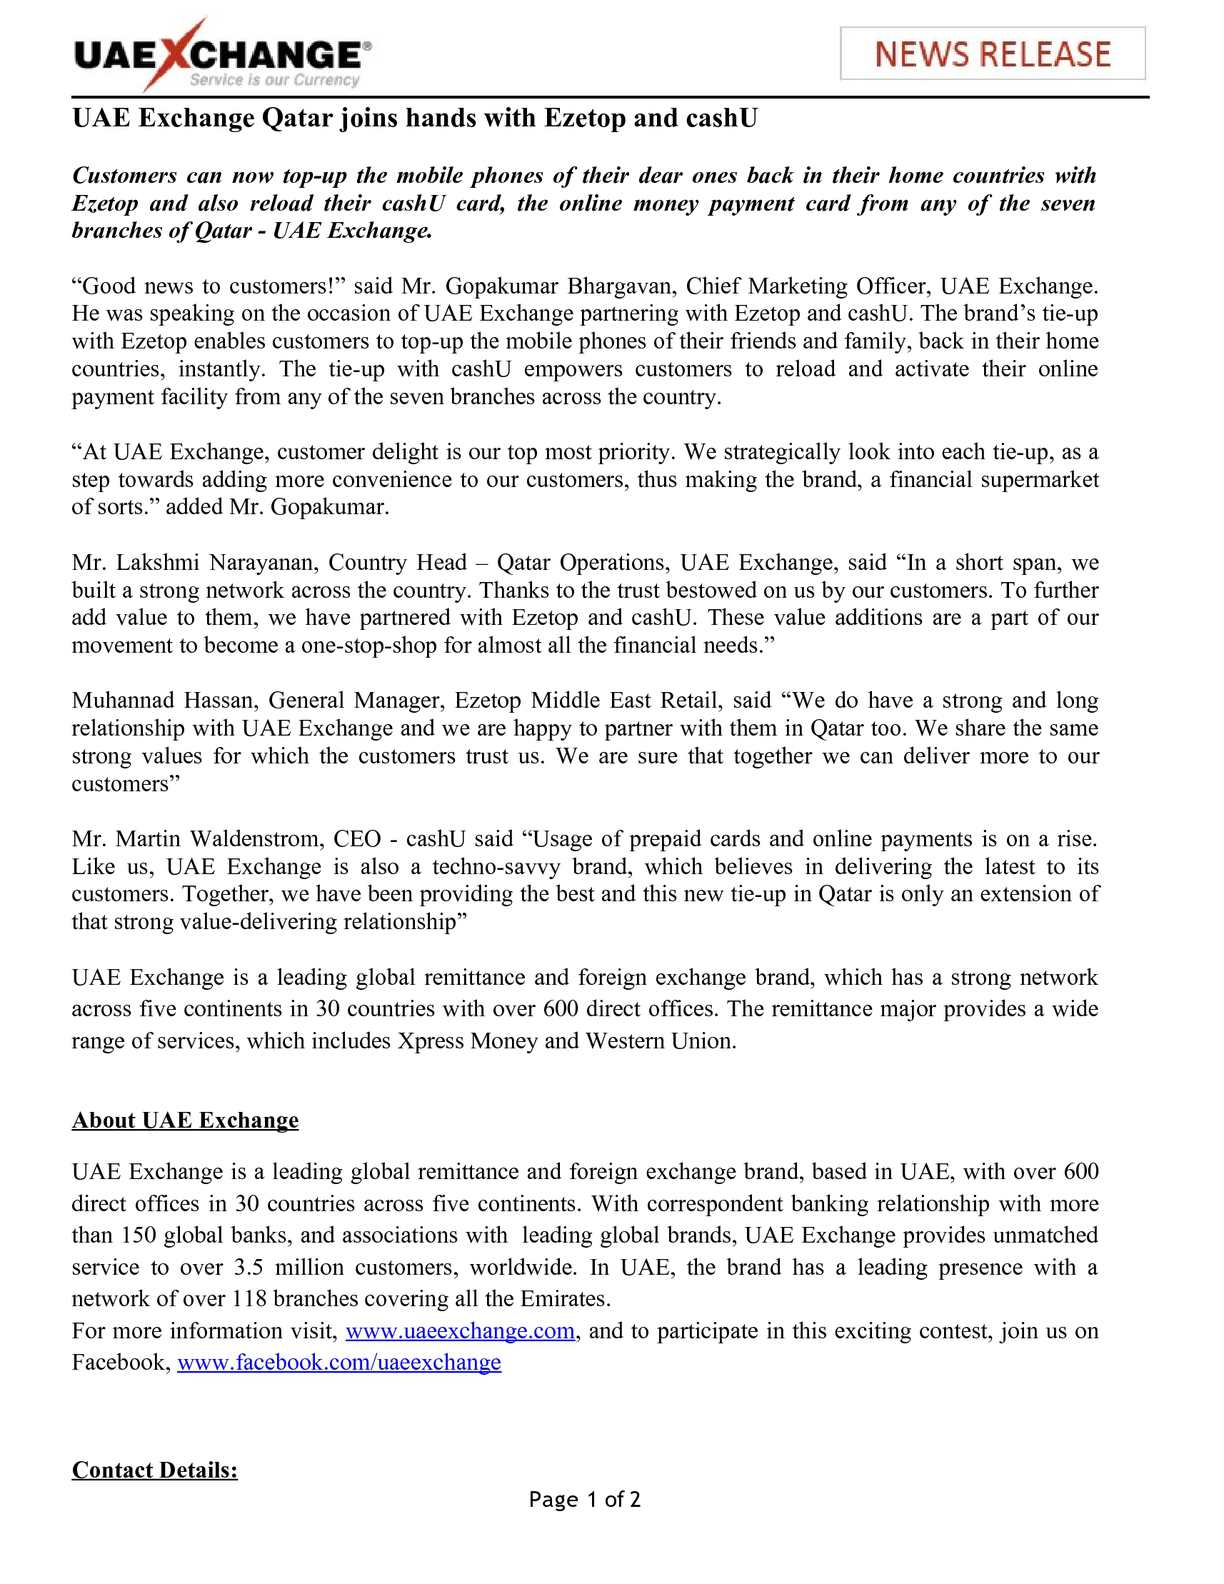 Calaméo - UAE Exchange Qatar joins hands with Ezetop and cashU